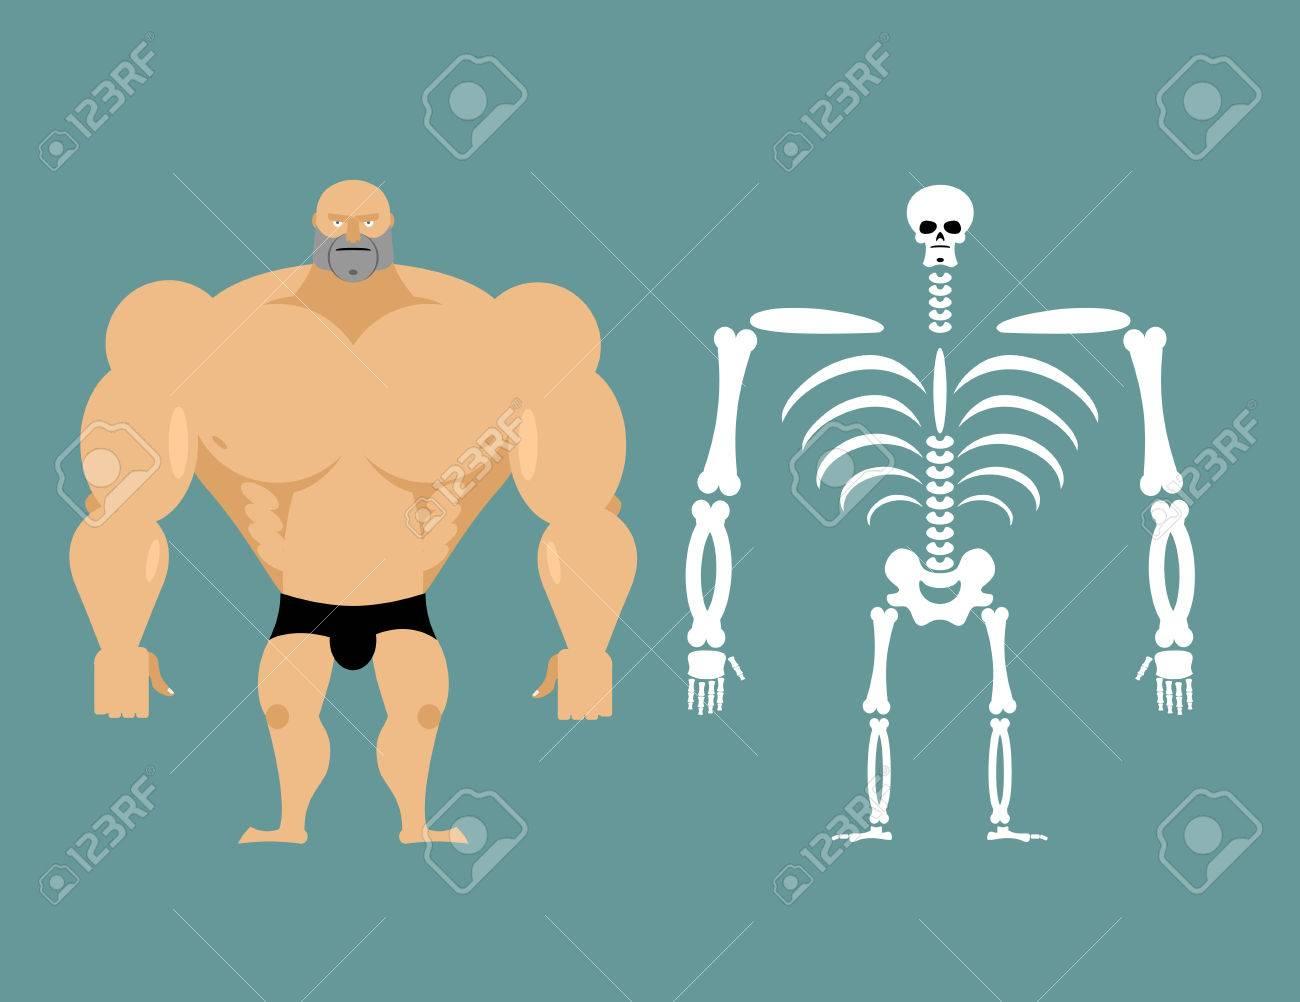 Estructura Humana. Hombres Esqueléticos. Construcción De Atleta ...